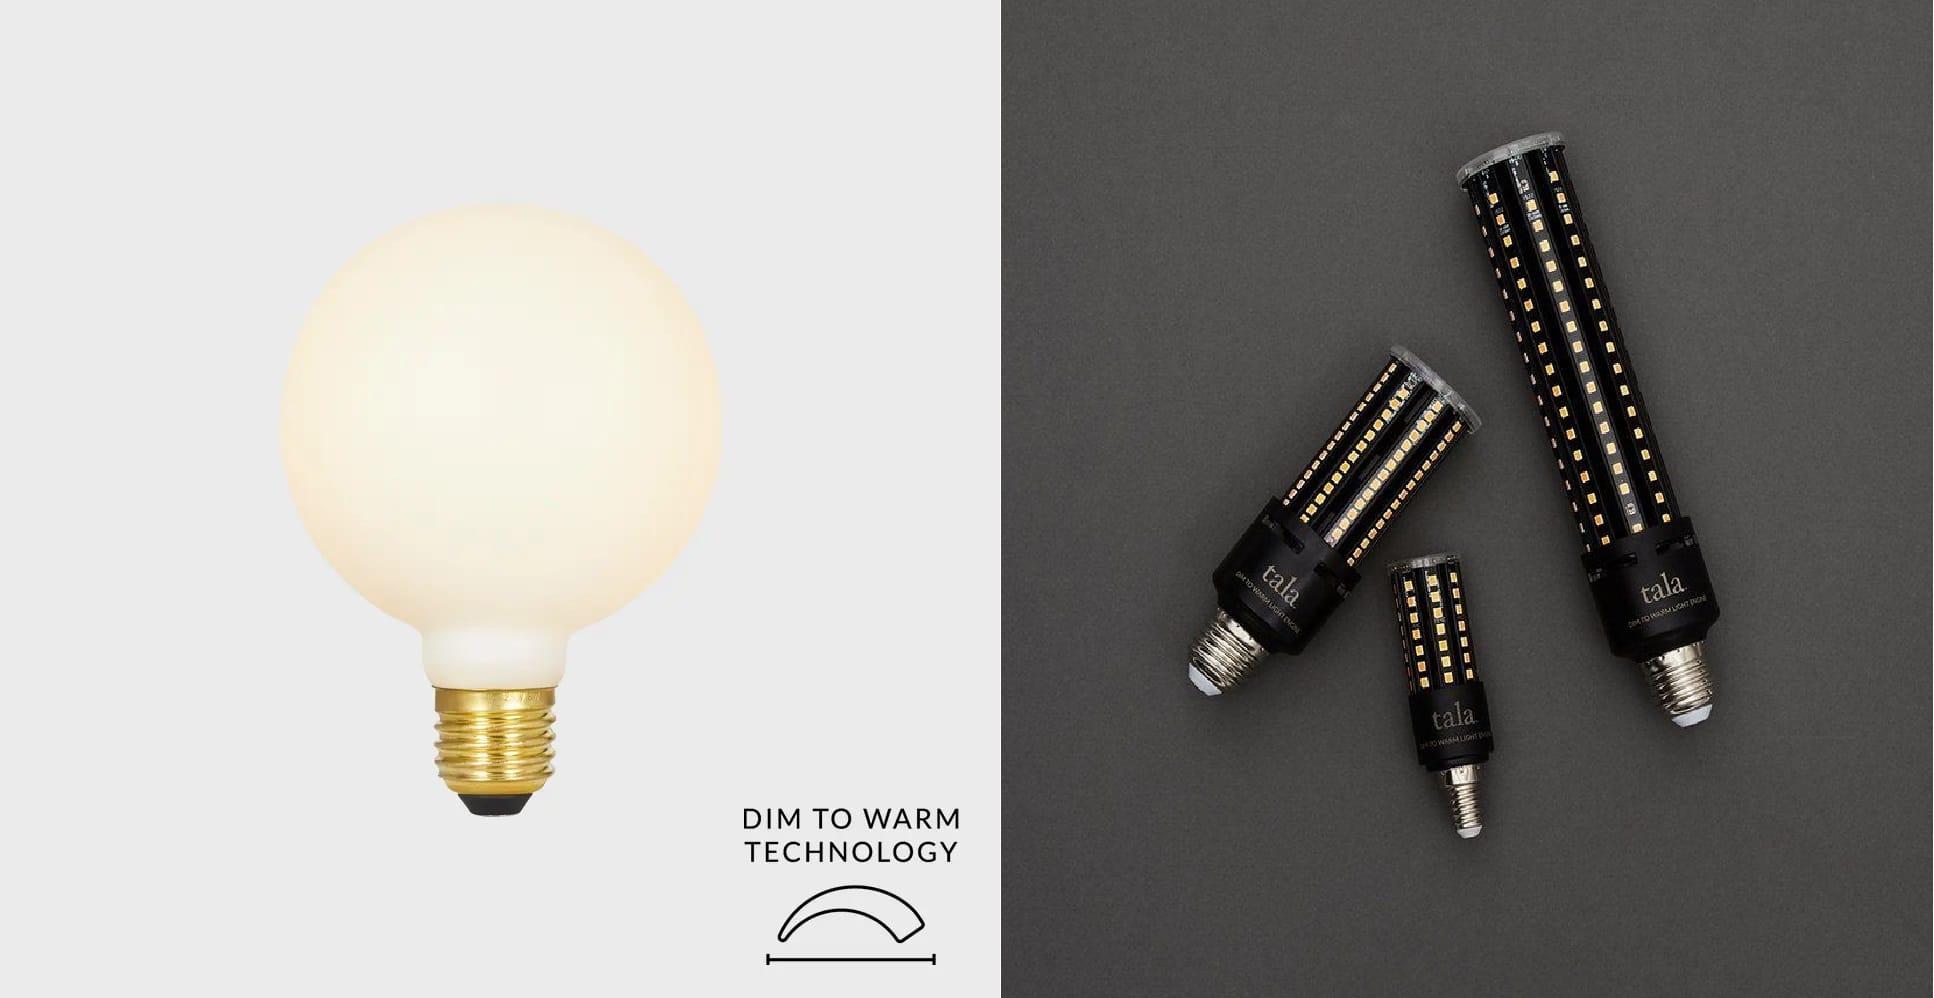 روشنایی هوشمند دیم تو وارم